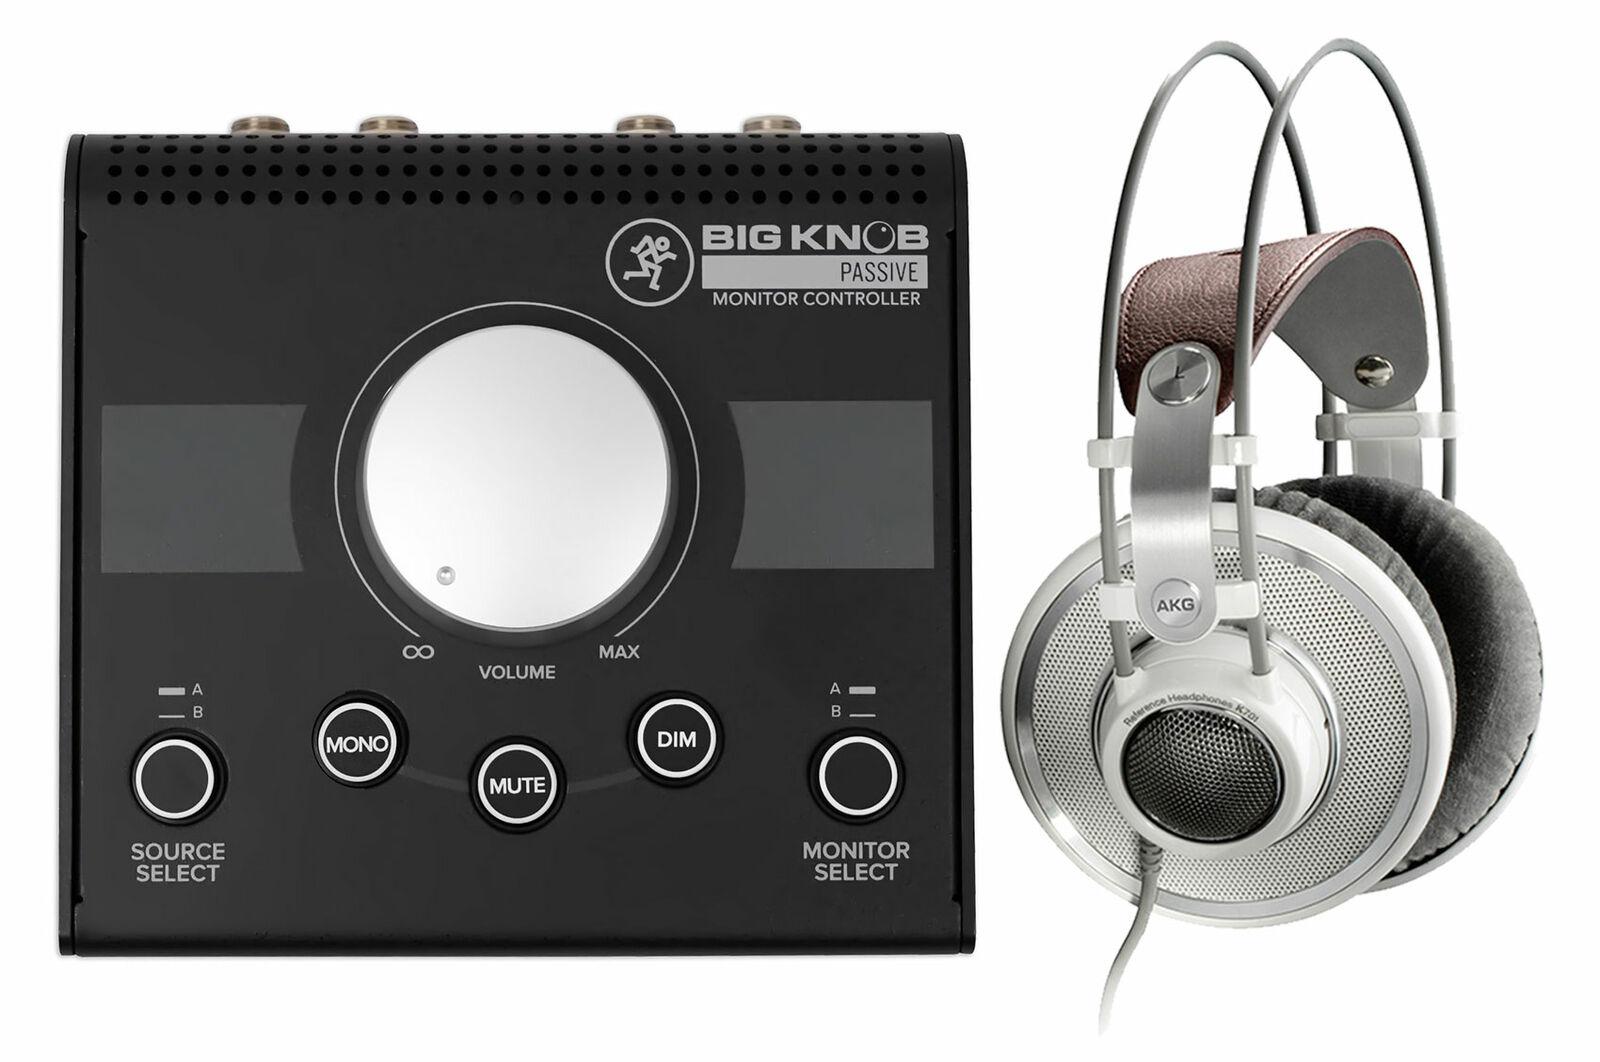 AKG K701 Premium Open-Back Studio Reference Monitor Kopfhörer Mackie Big Knob